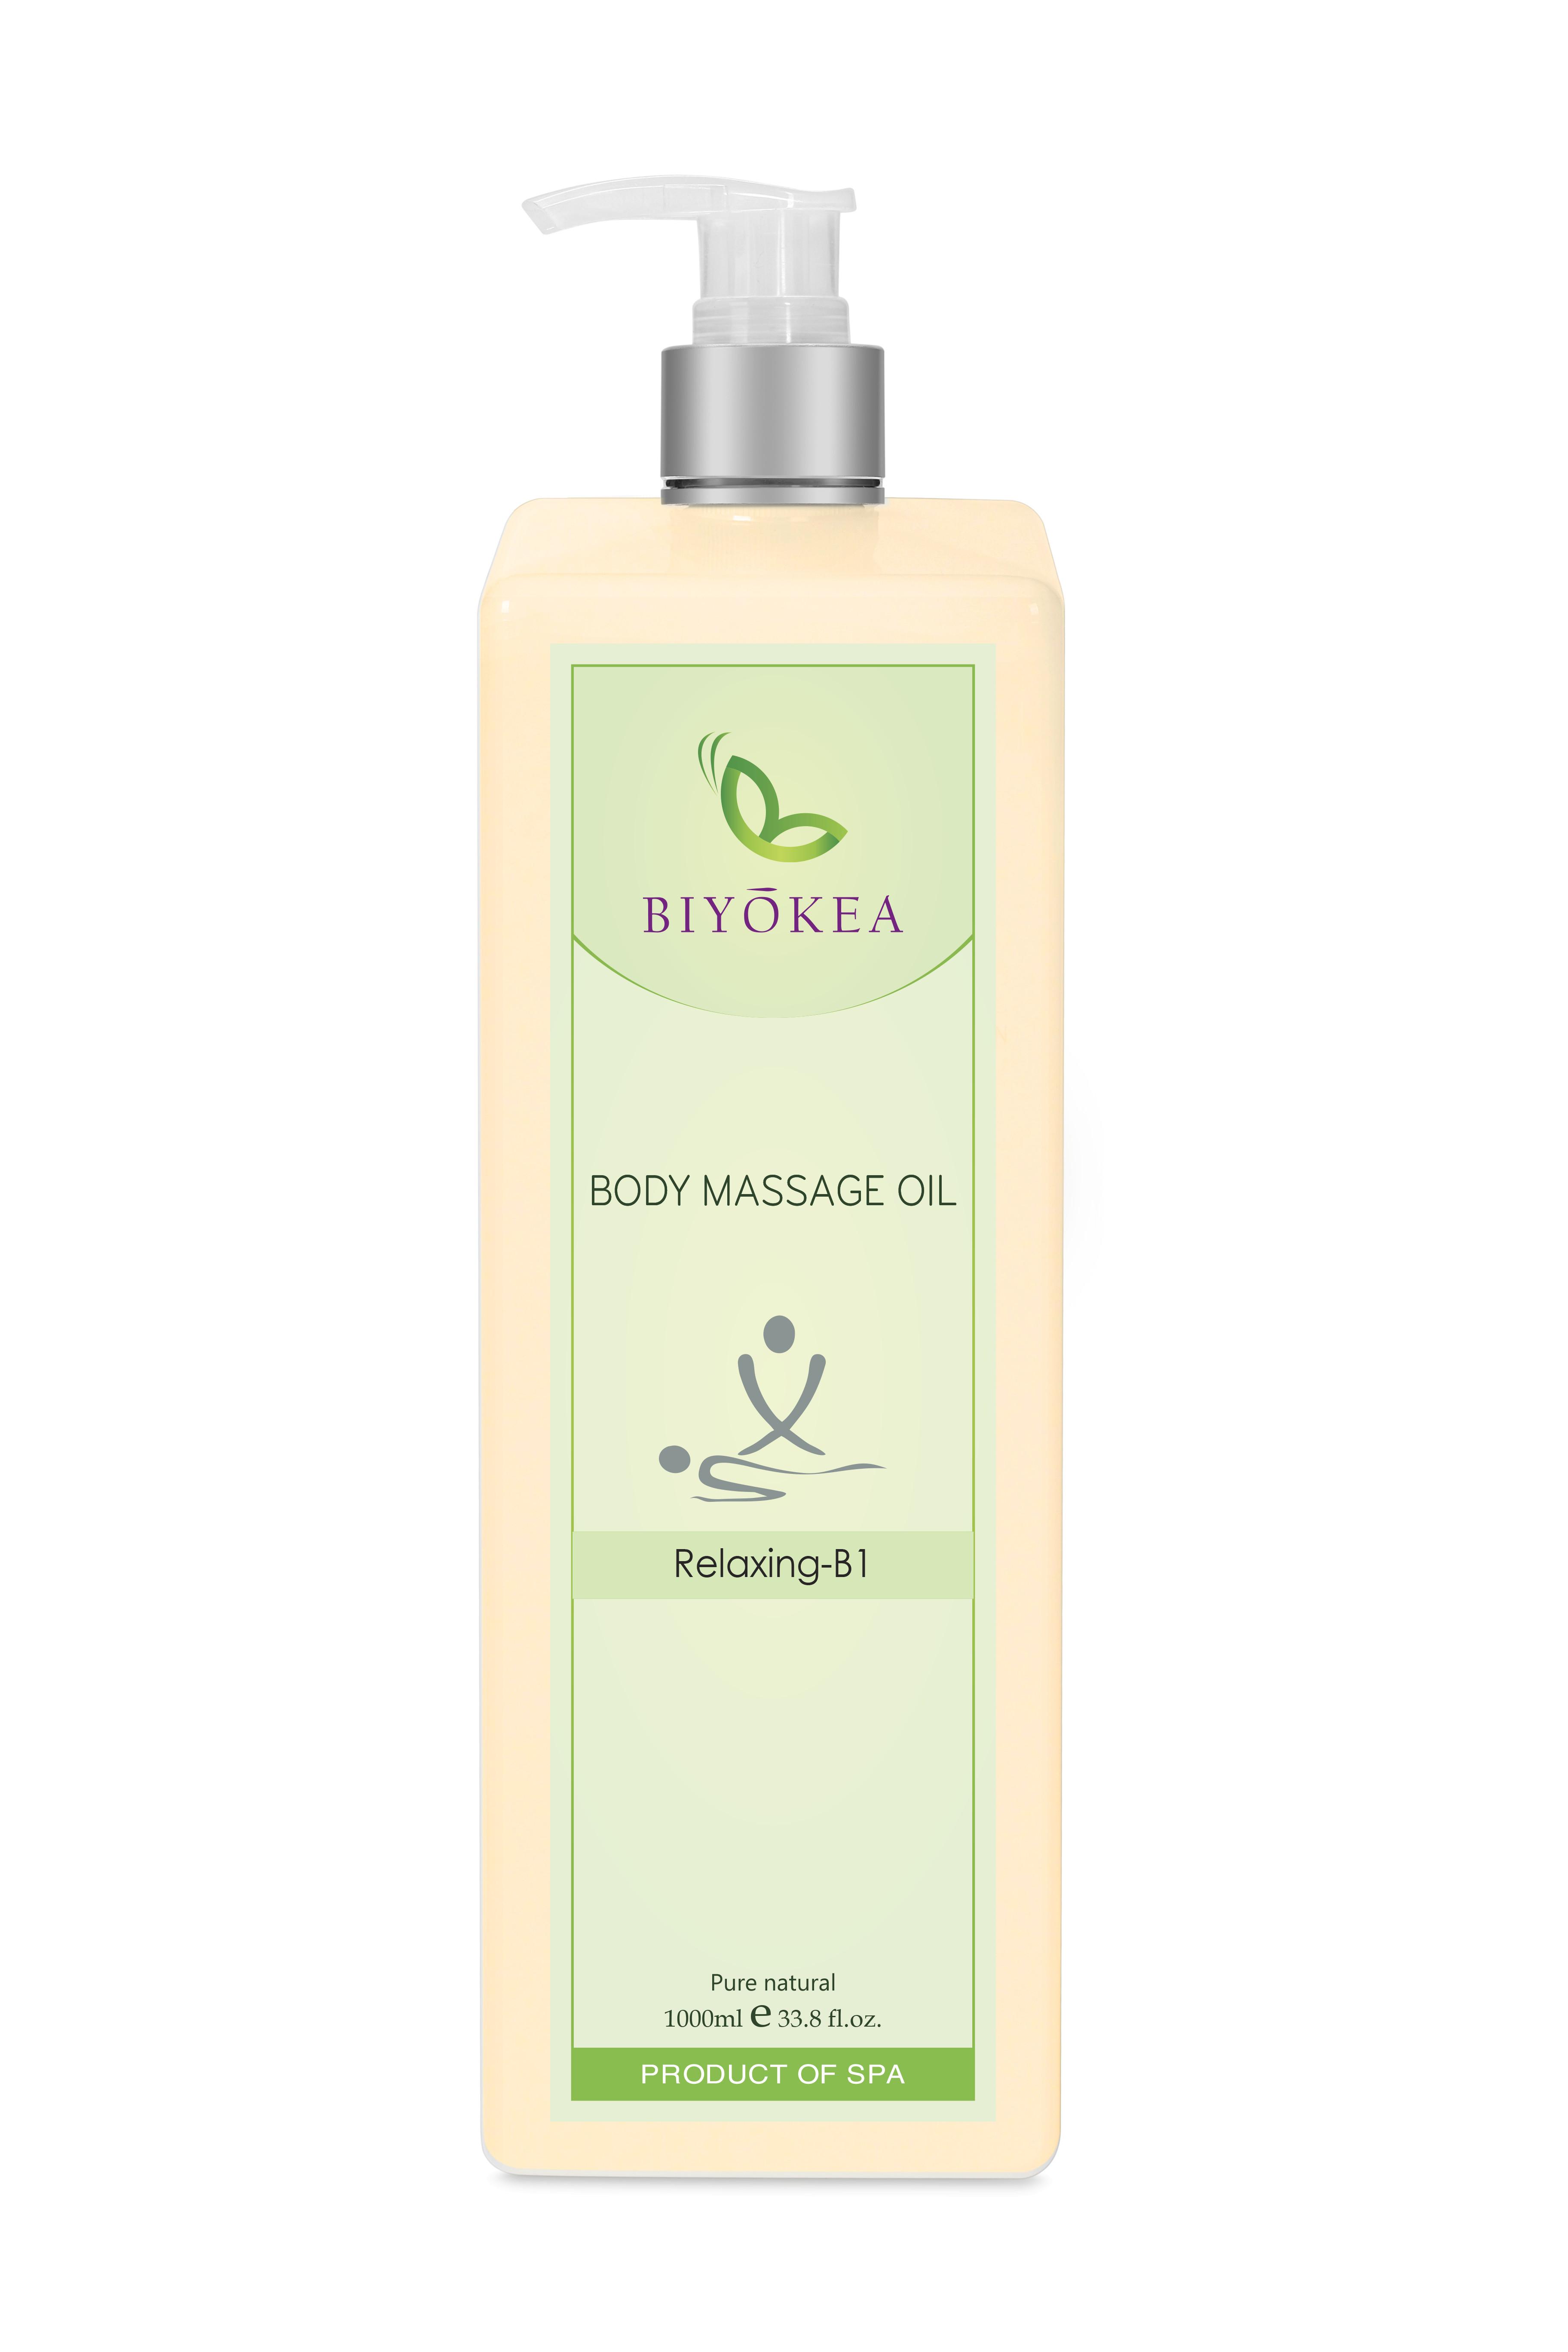 Dầu Massage Body  Biyokea - Relaxing B1 (thư giãn) - 1000ml